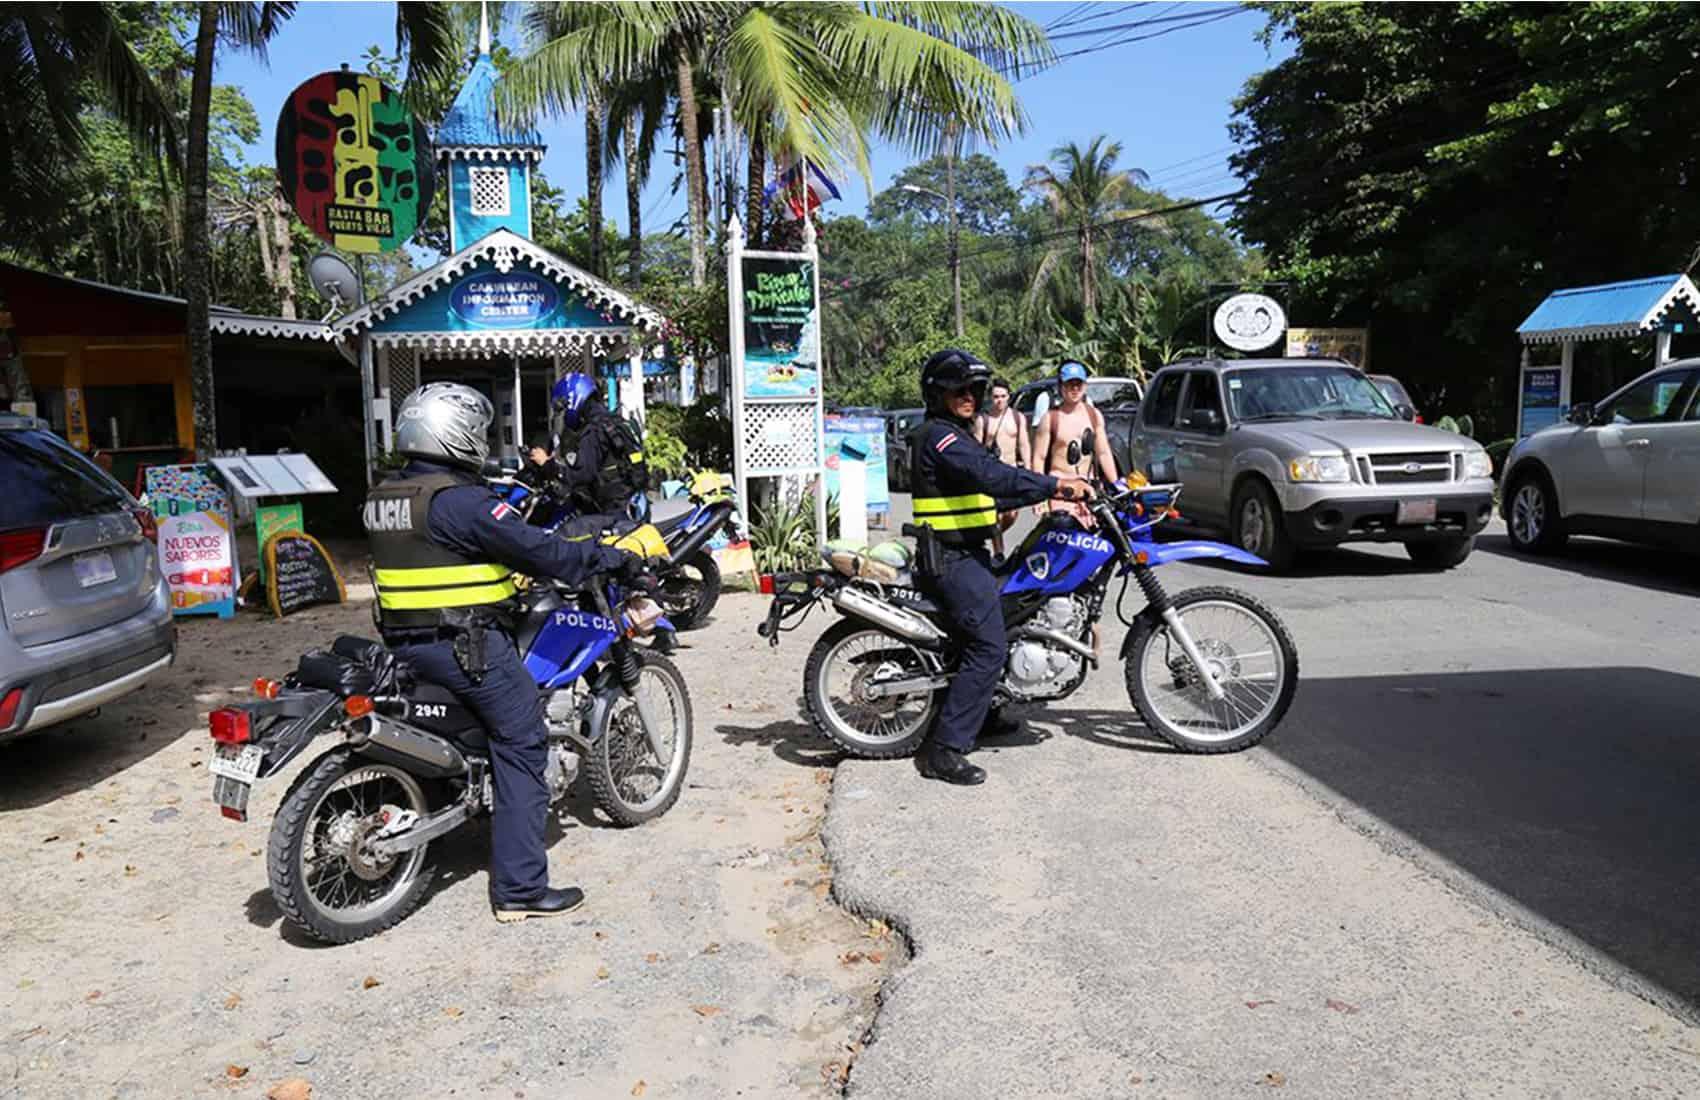 Police surveillance at Cahuita. March 13, 2017.